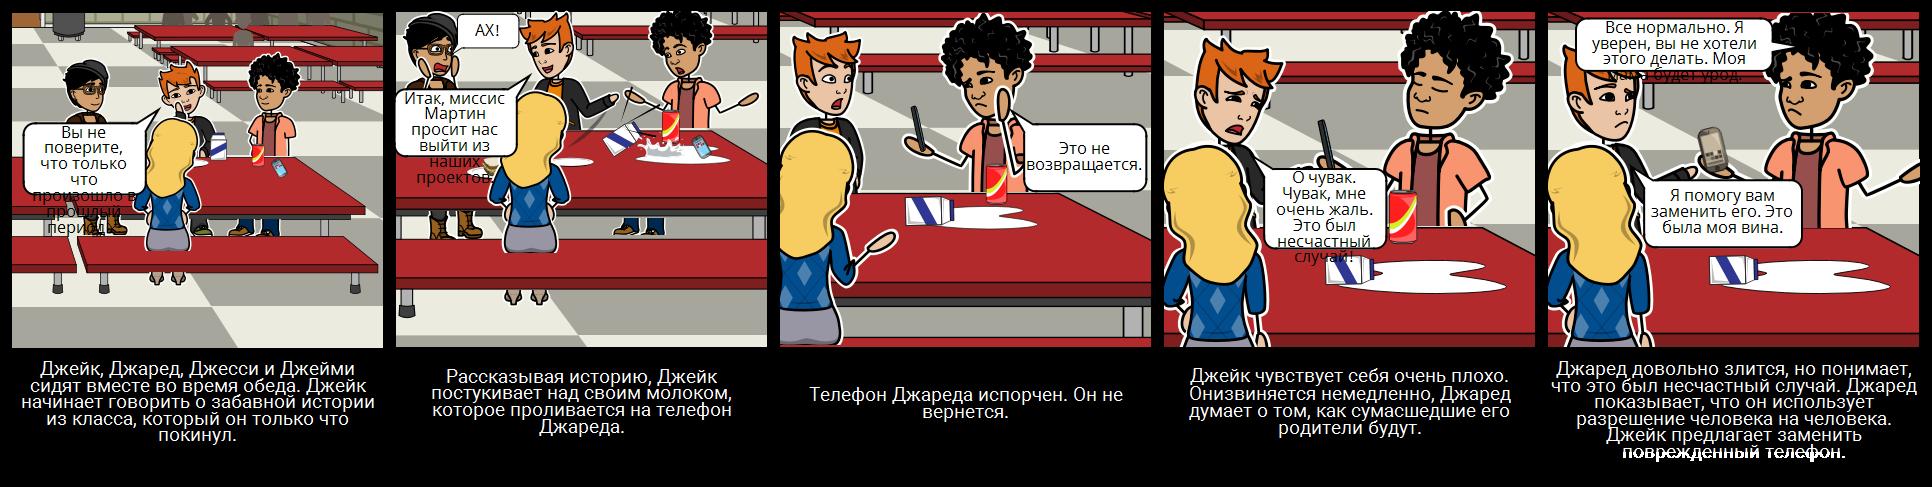 Сценарий Конфликтов